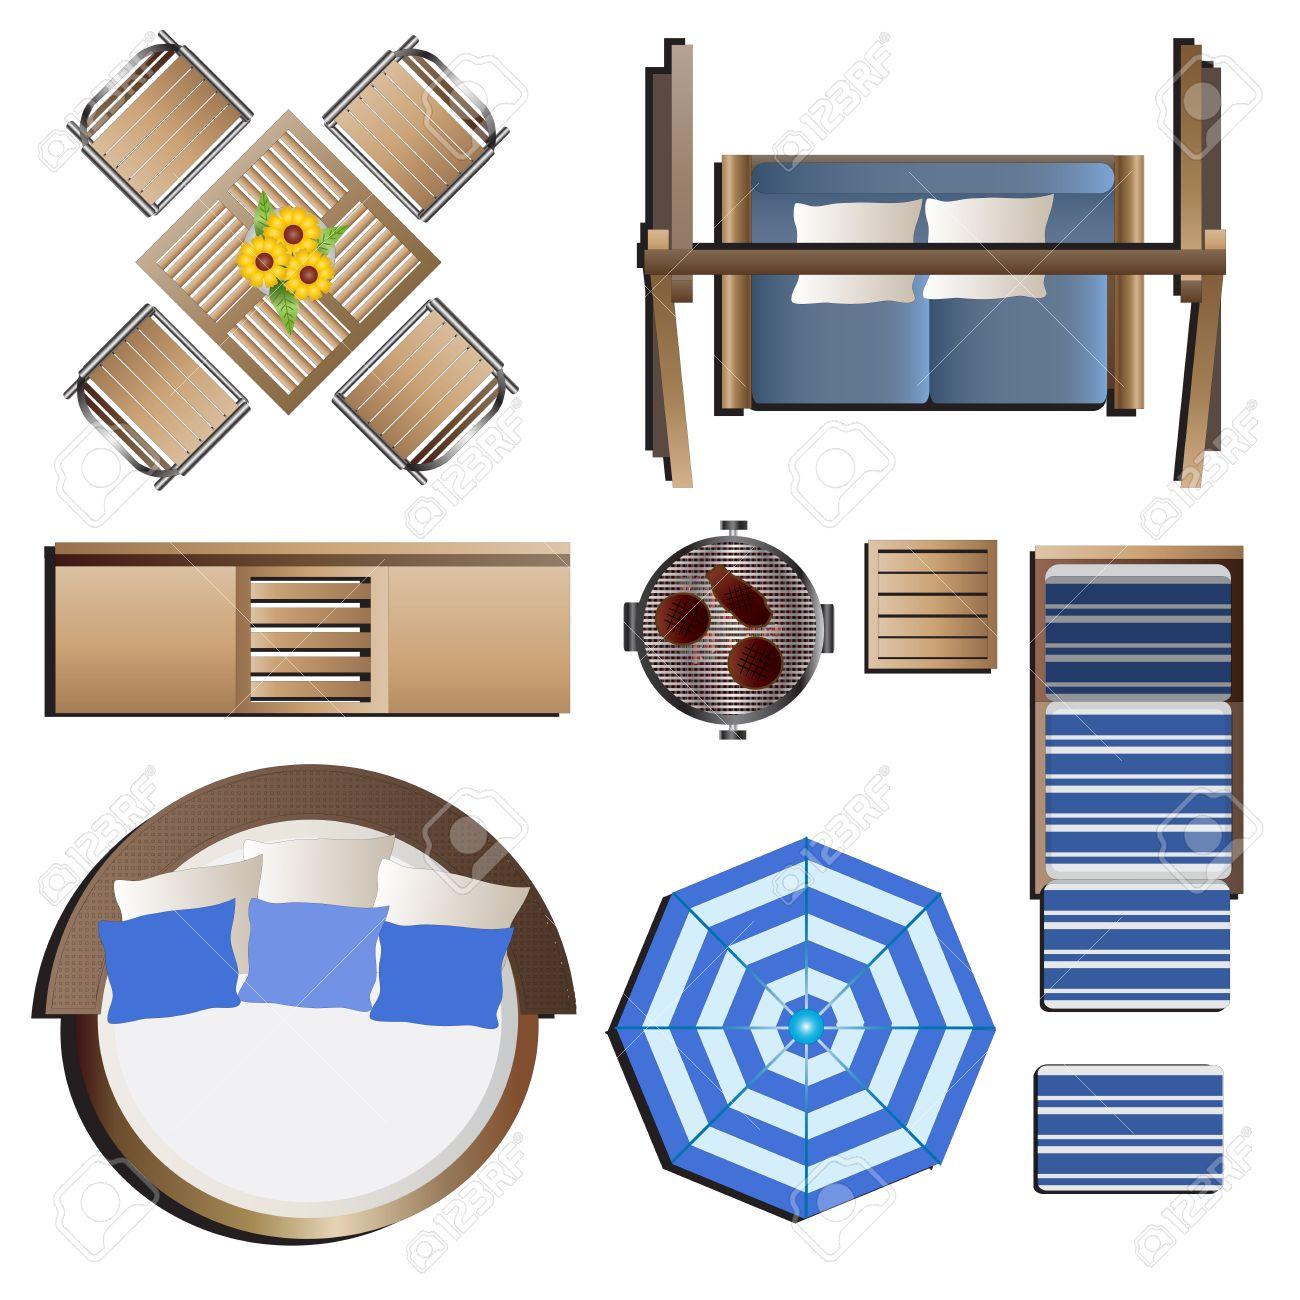 Outdoor furniture top view set 19 for landscape design vector illustration stock vector 48756158